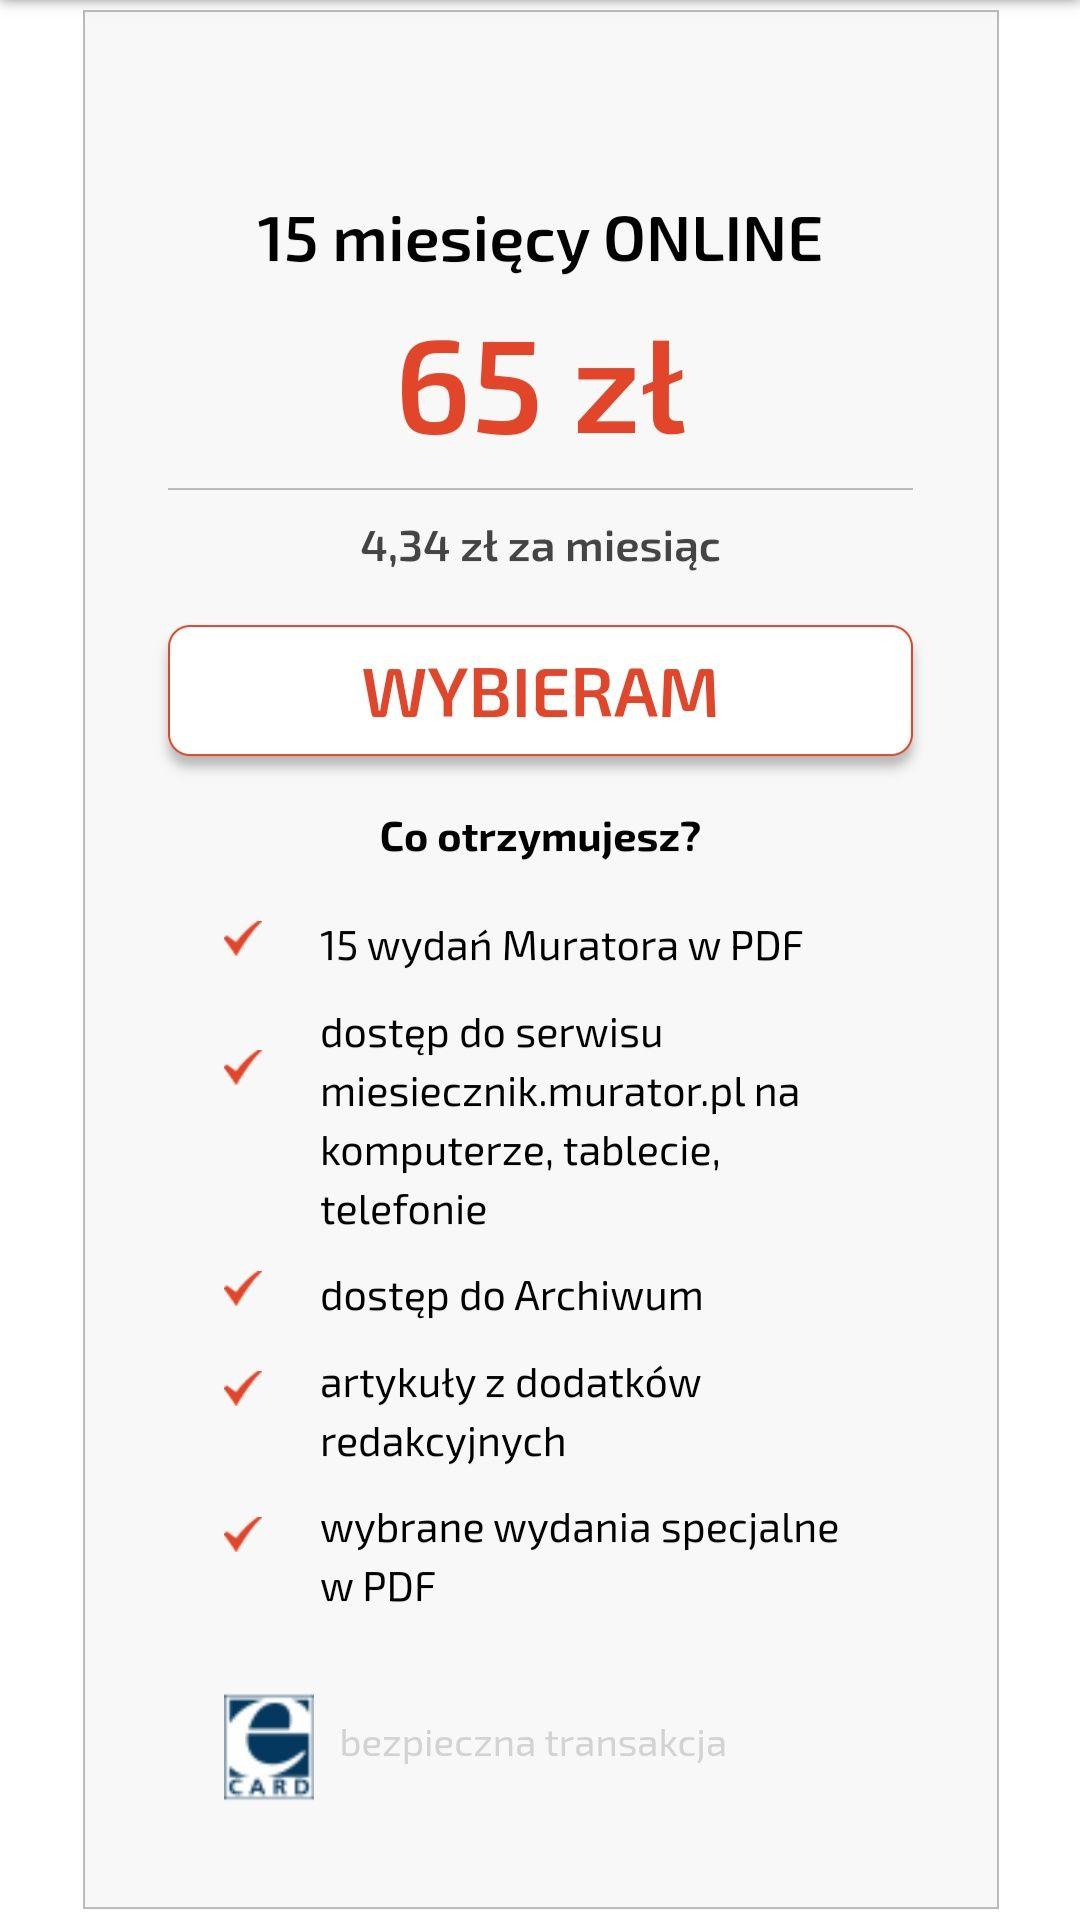 Prenumerata miesięcznika Murator 15 m-cy za 65 zł